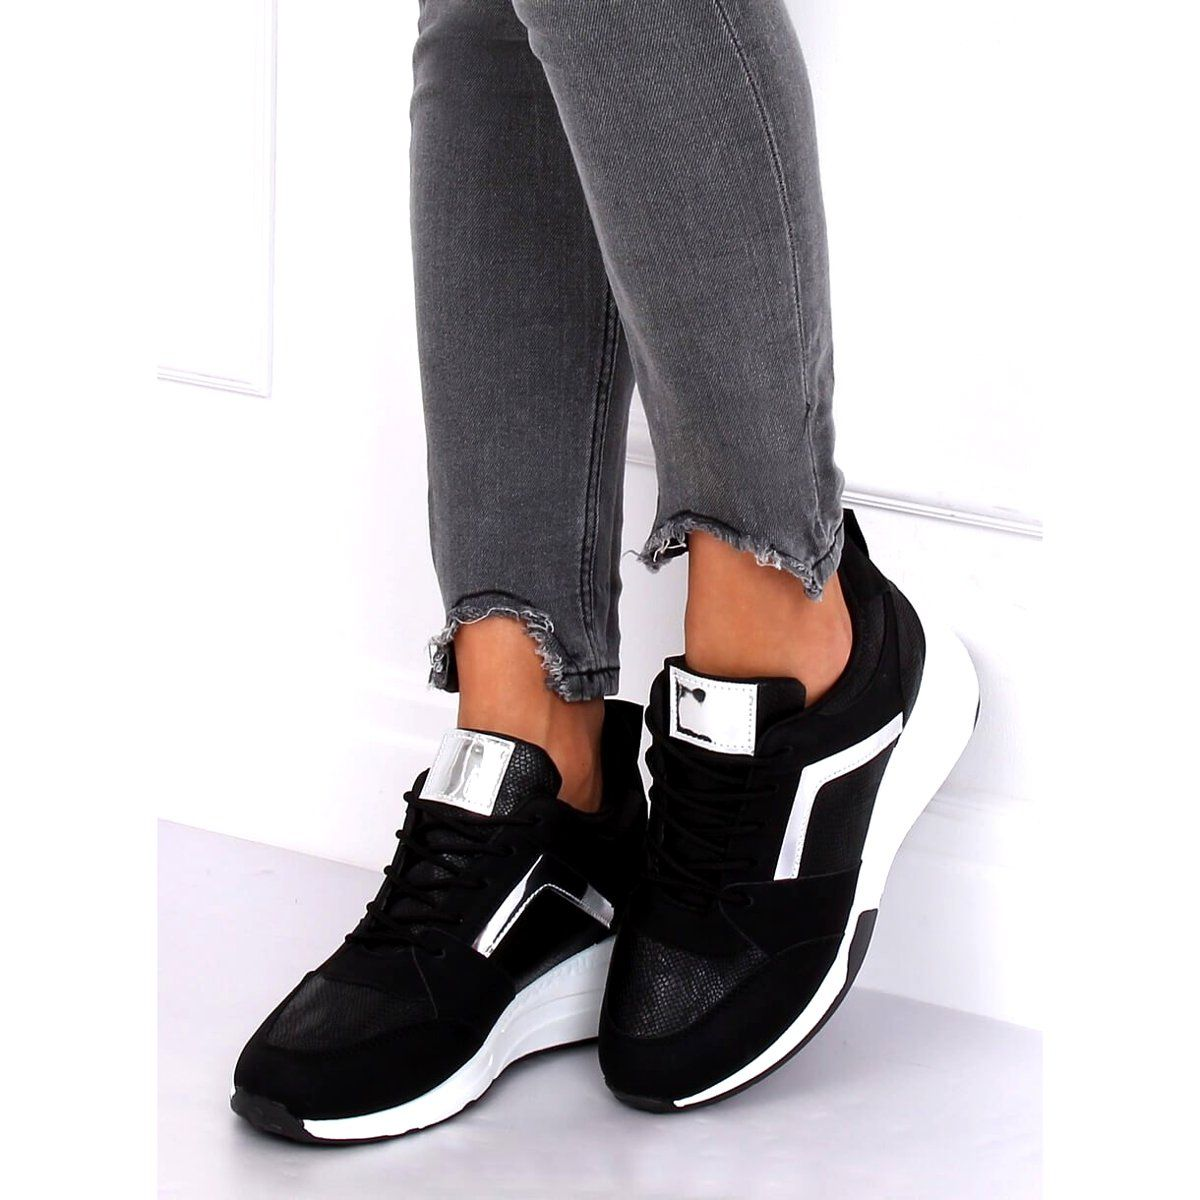 Sneakersy Na Koturnie Czarne Yl 33 Black Zolte Sneakers Shoes Balenciaga